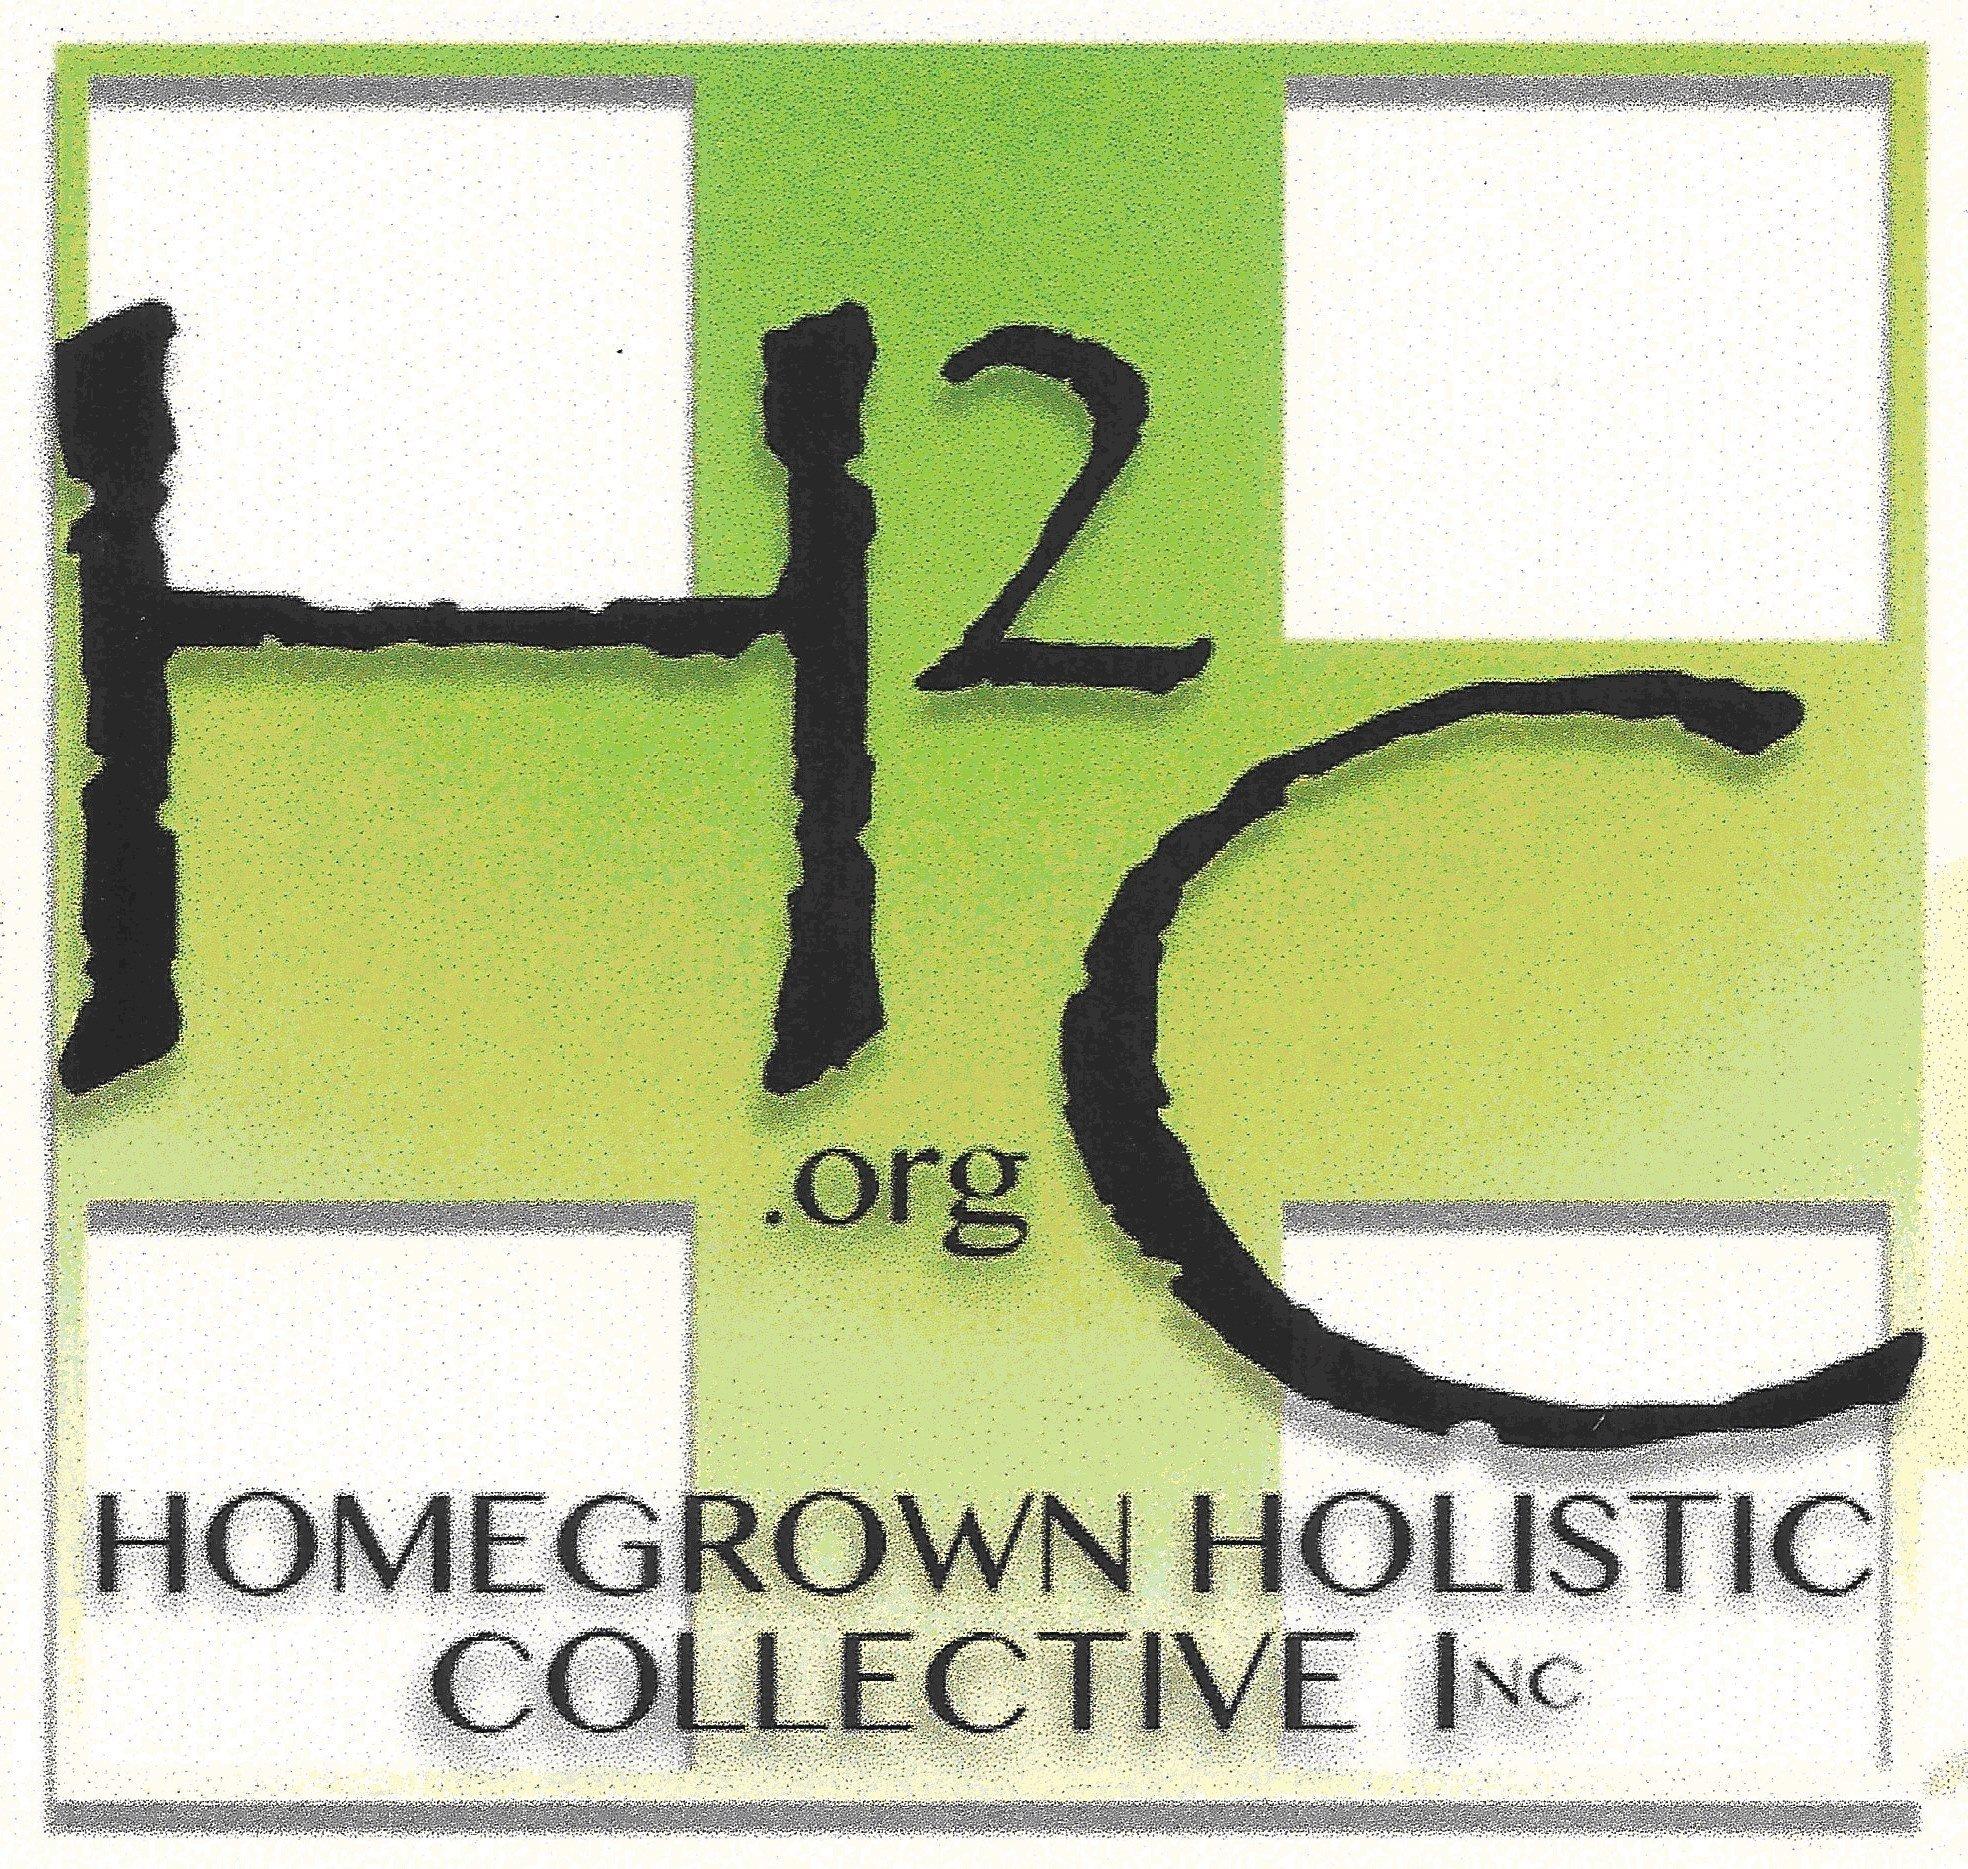 h2c.org